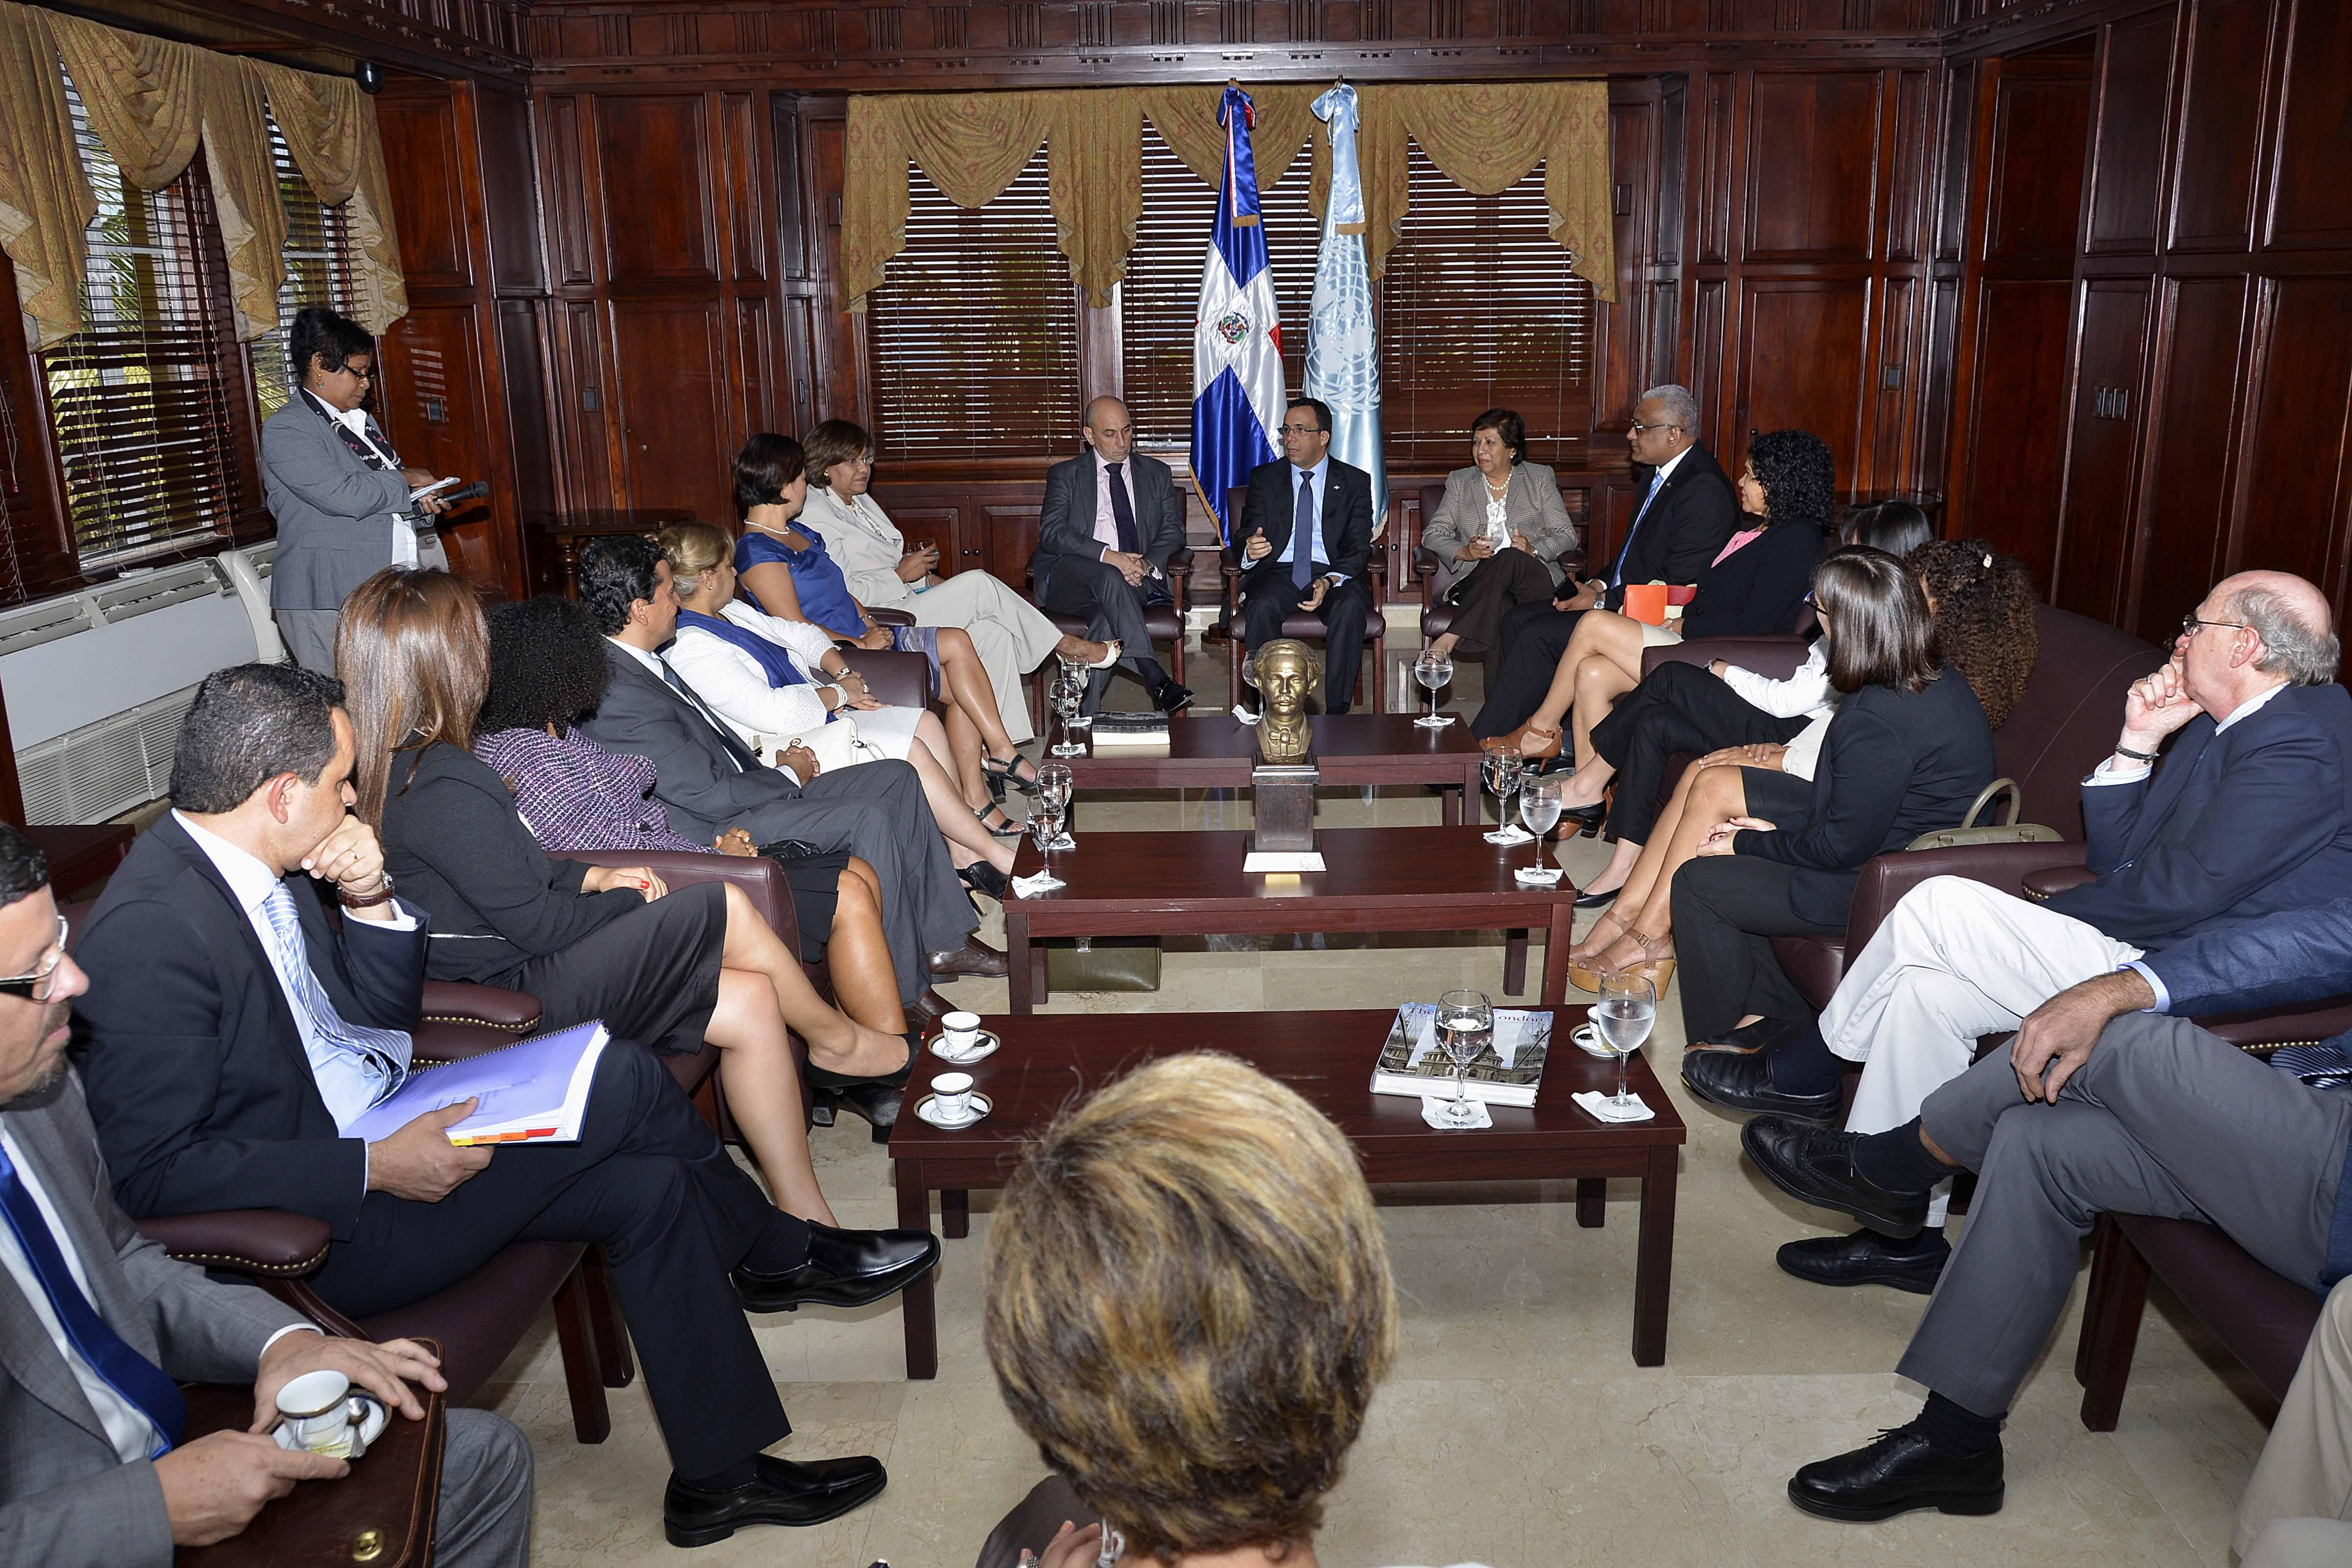 Canciller ratifica compromiso de RD con ONU